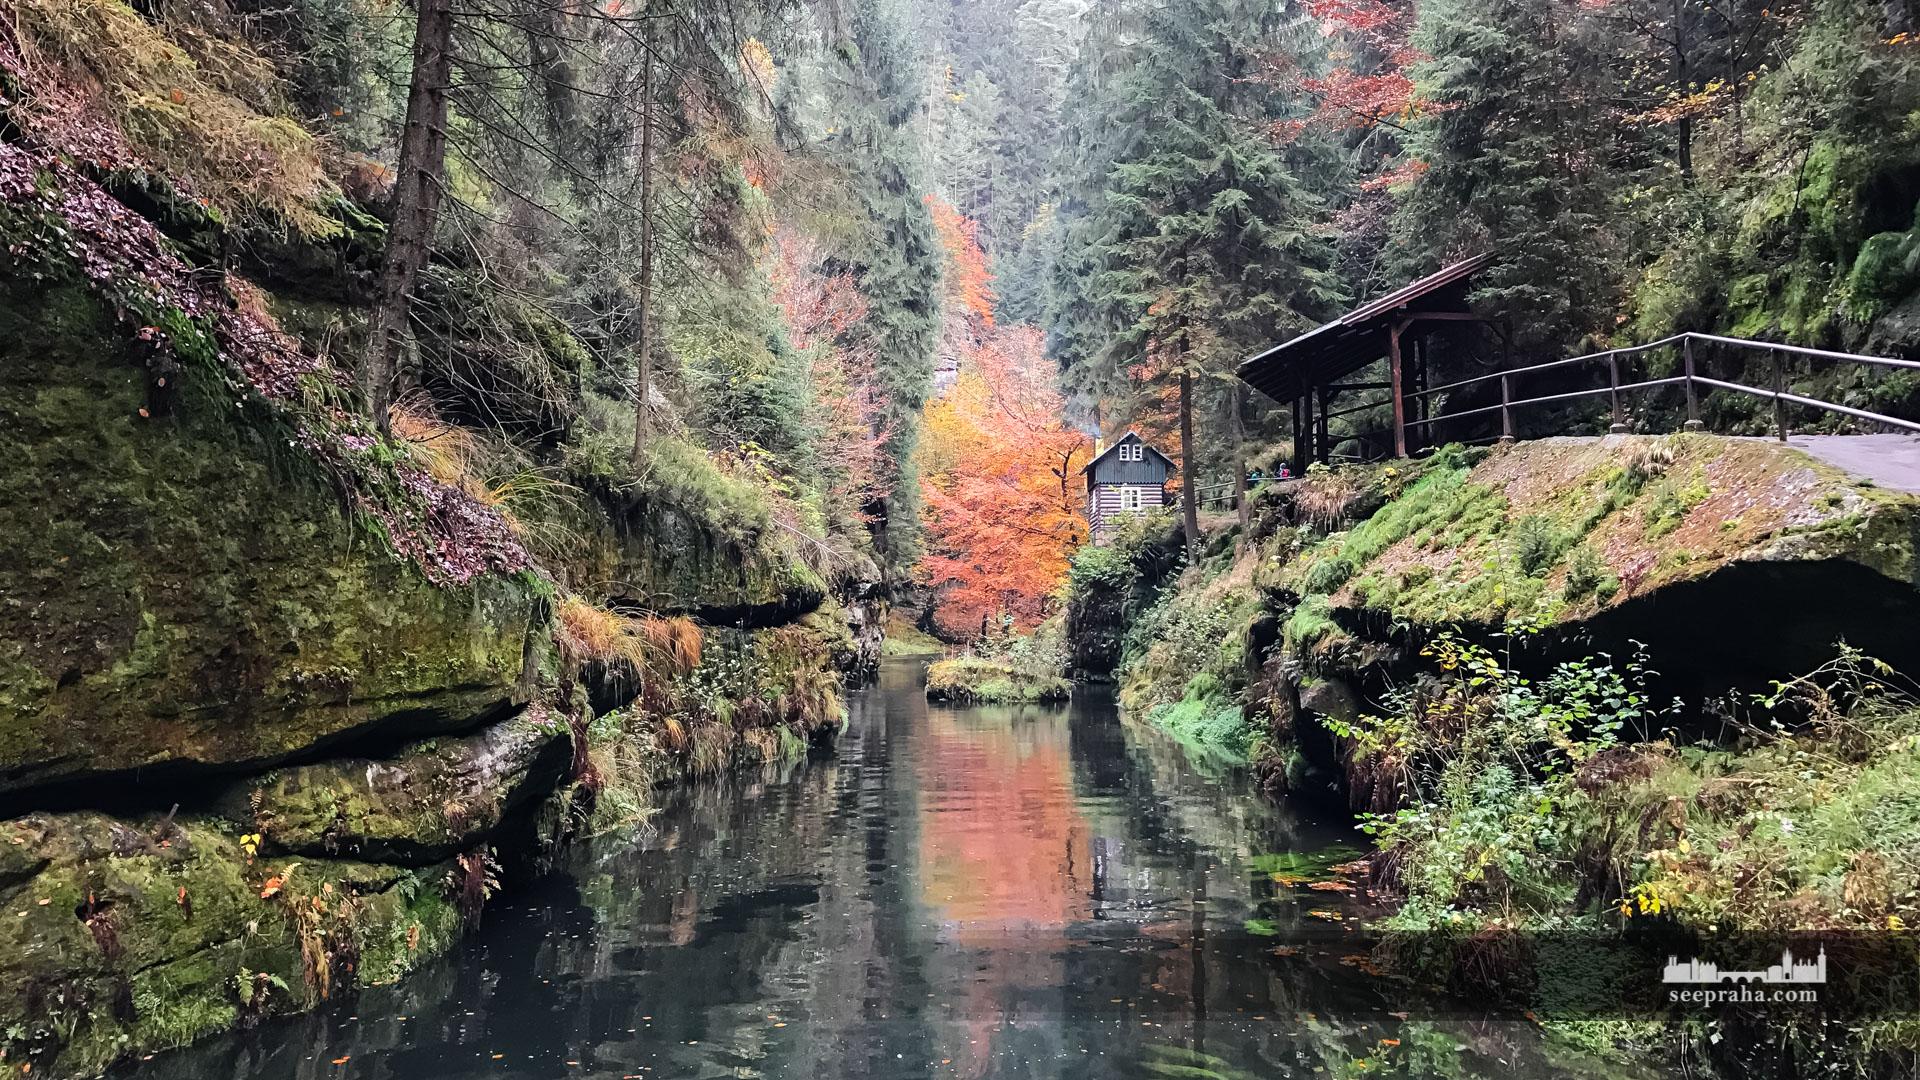 Картинки швейцария парки, открыток картинка надписью